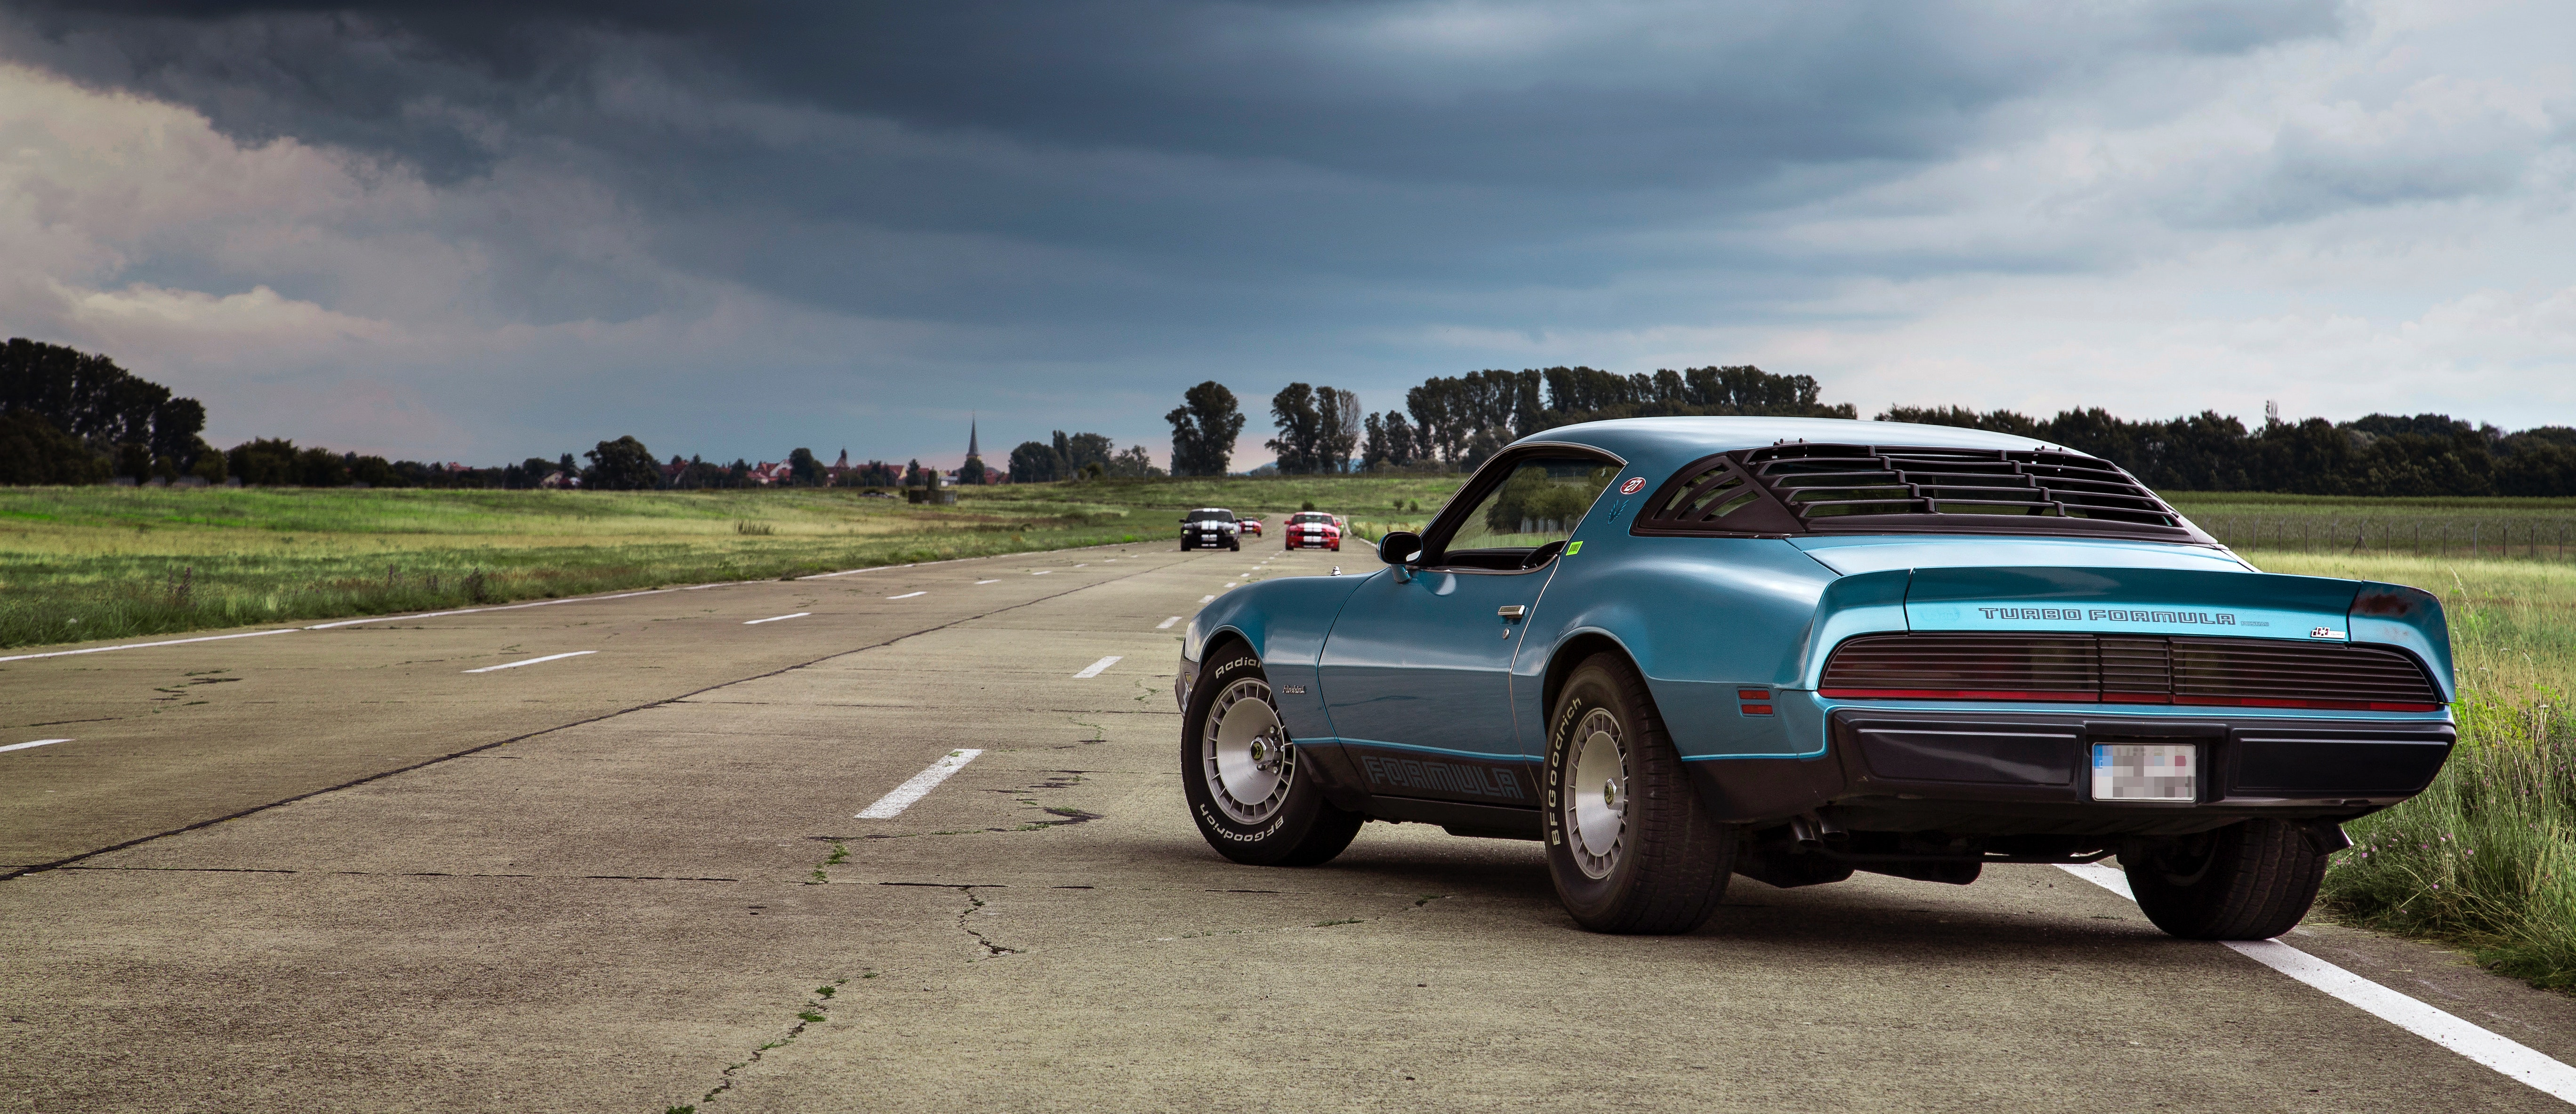 action-american-car-asphalt-981035